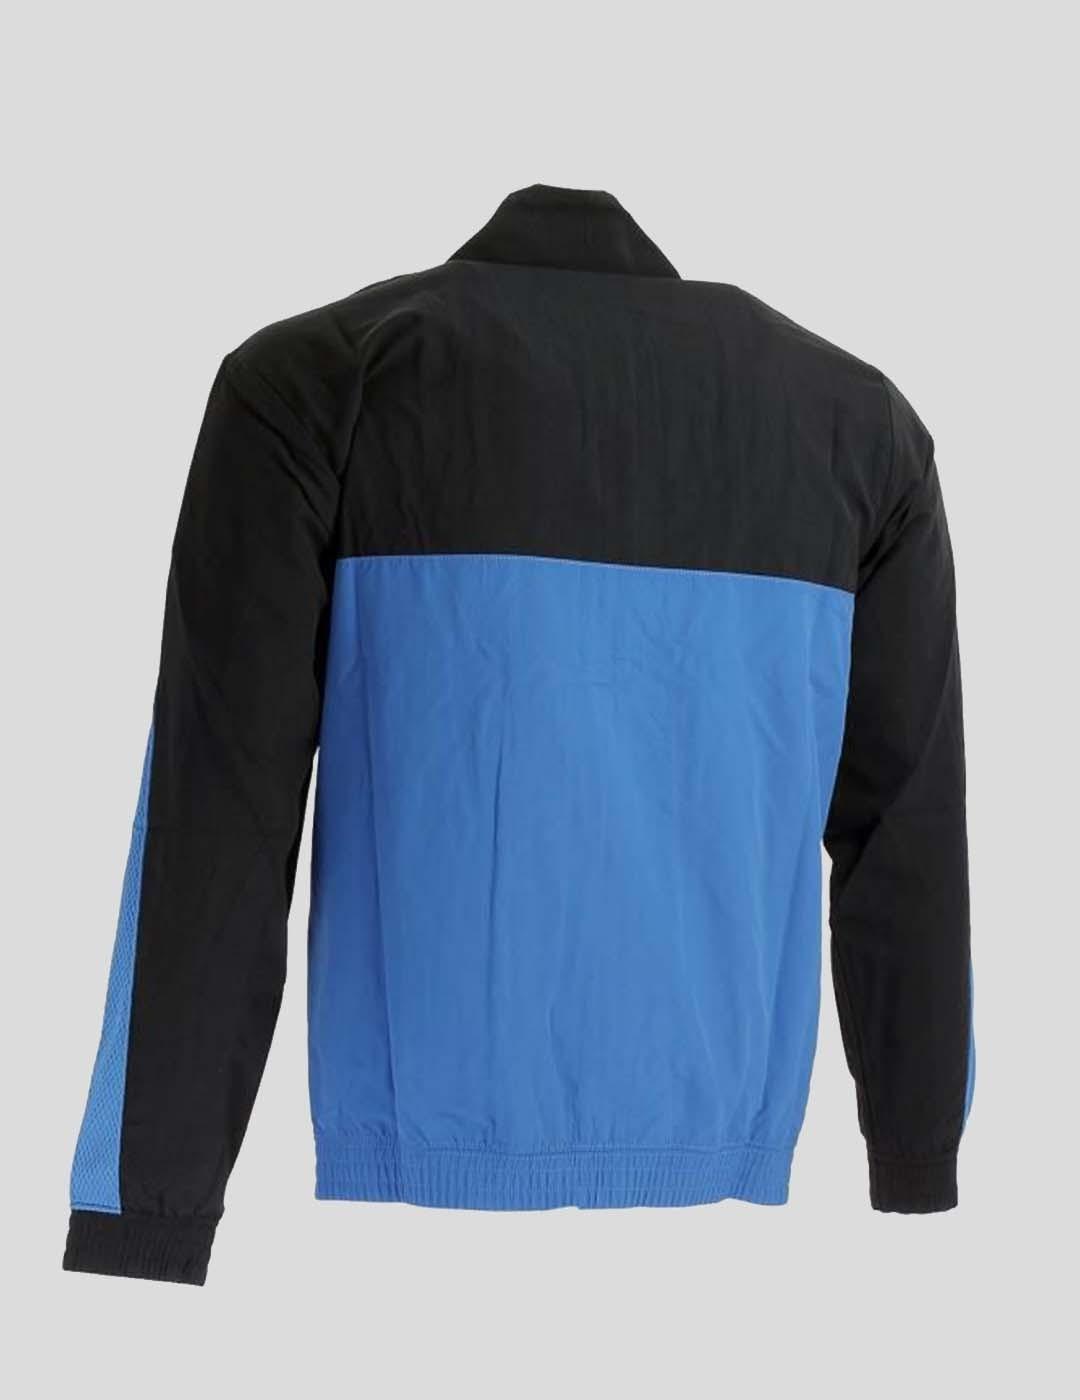 CHAQUETA CHAMPION  ZIP-UP COLOUR BLOCK AND STRIPE TRACK JACKET BLUE BLACK